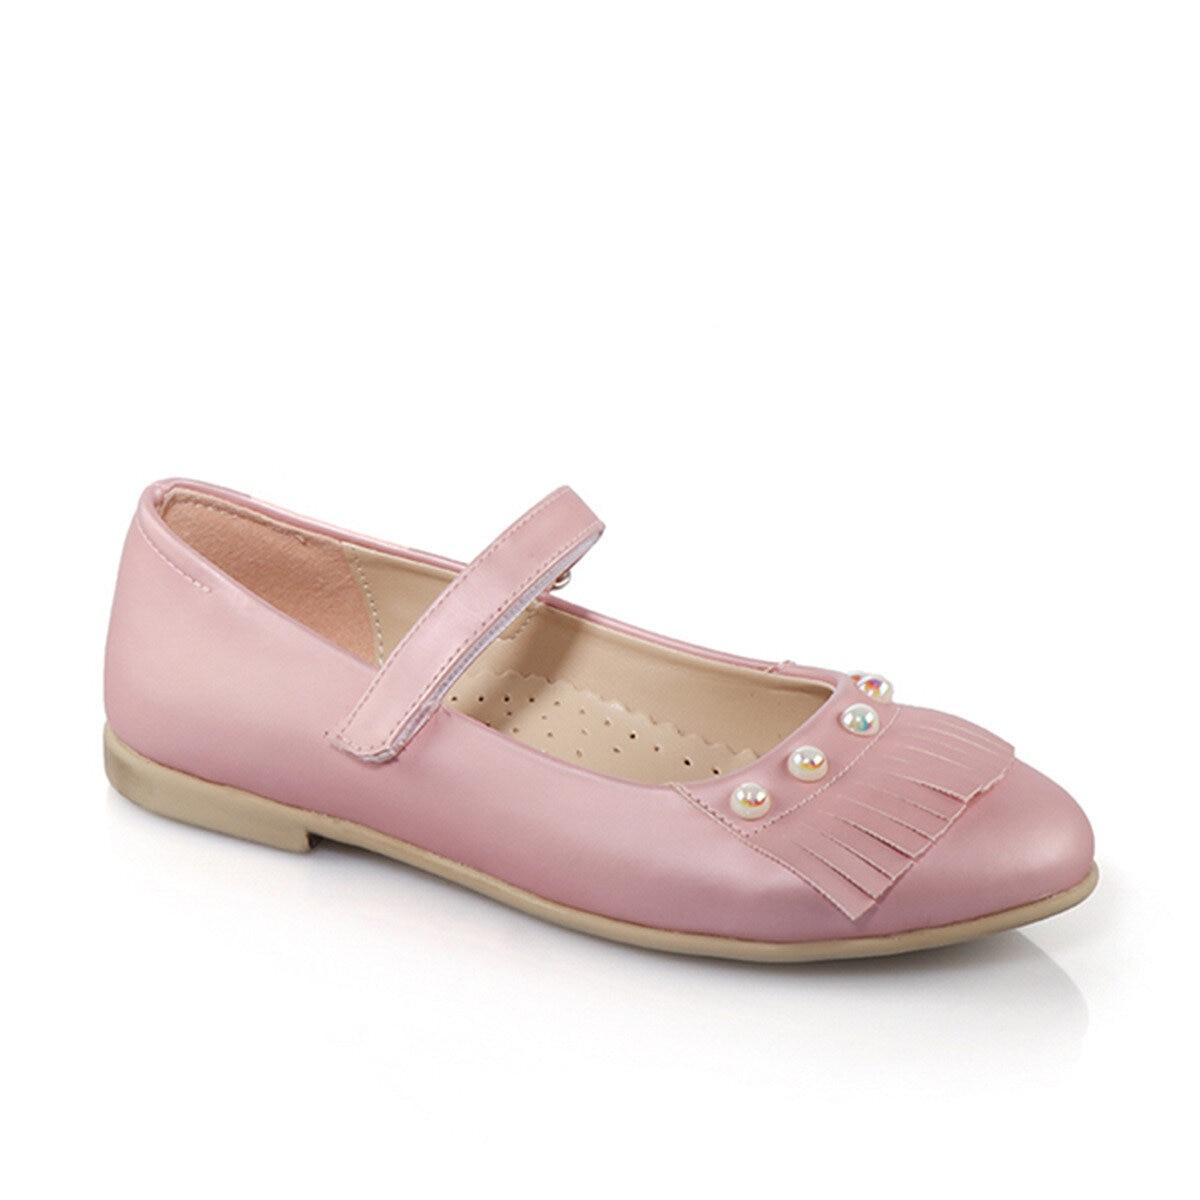 FLO 936.18Y. 460 Pink Female Child Ballerina VICCO